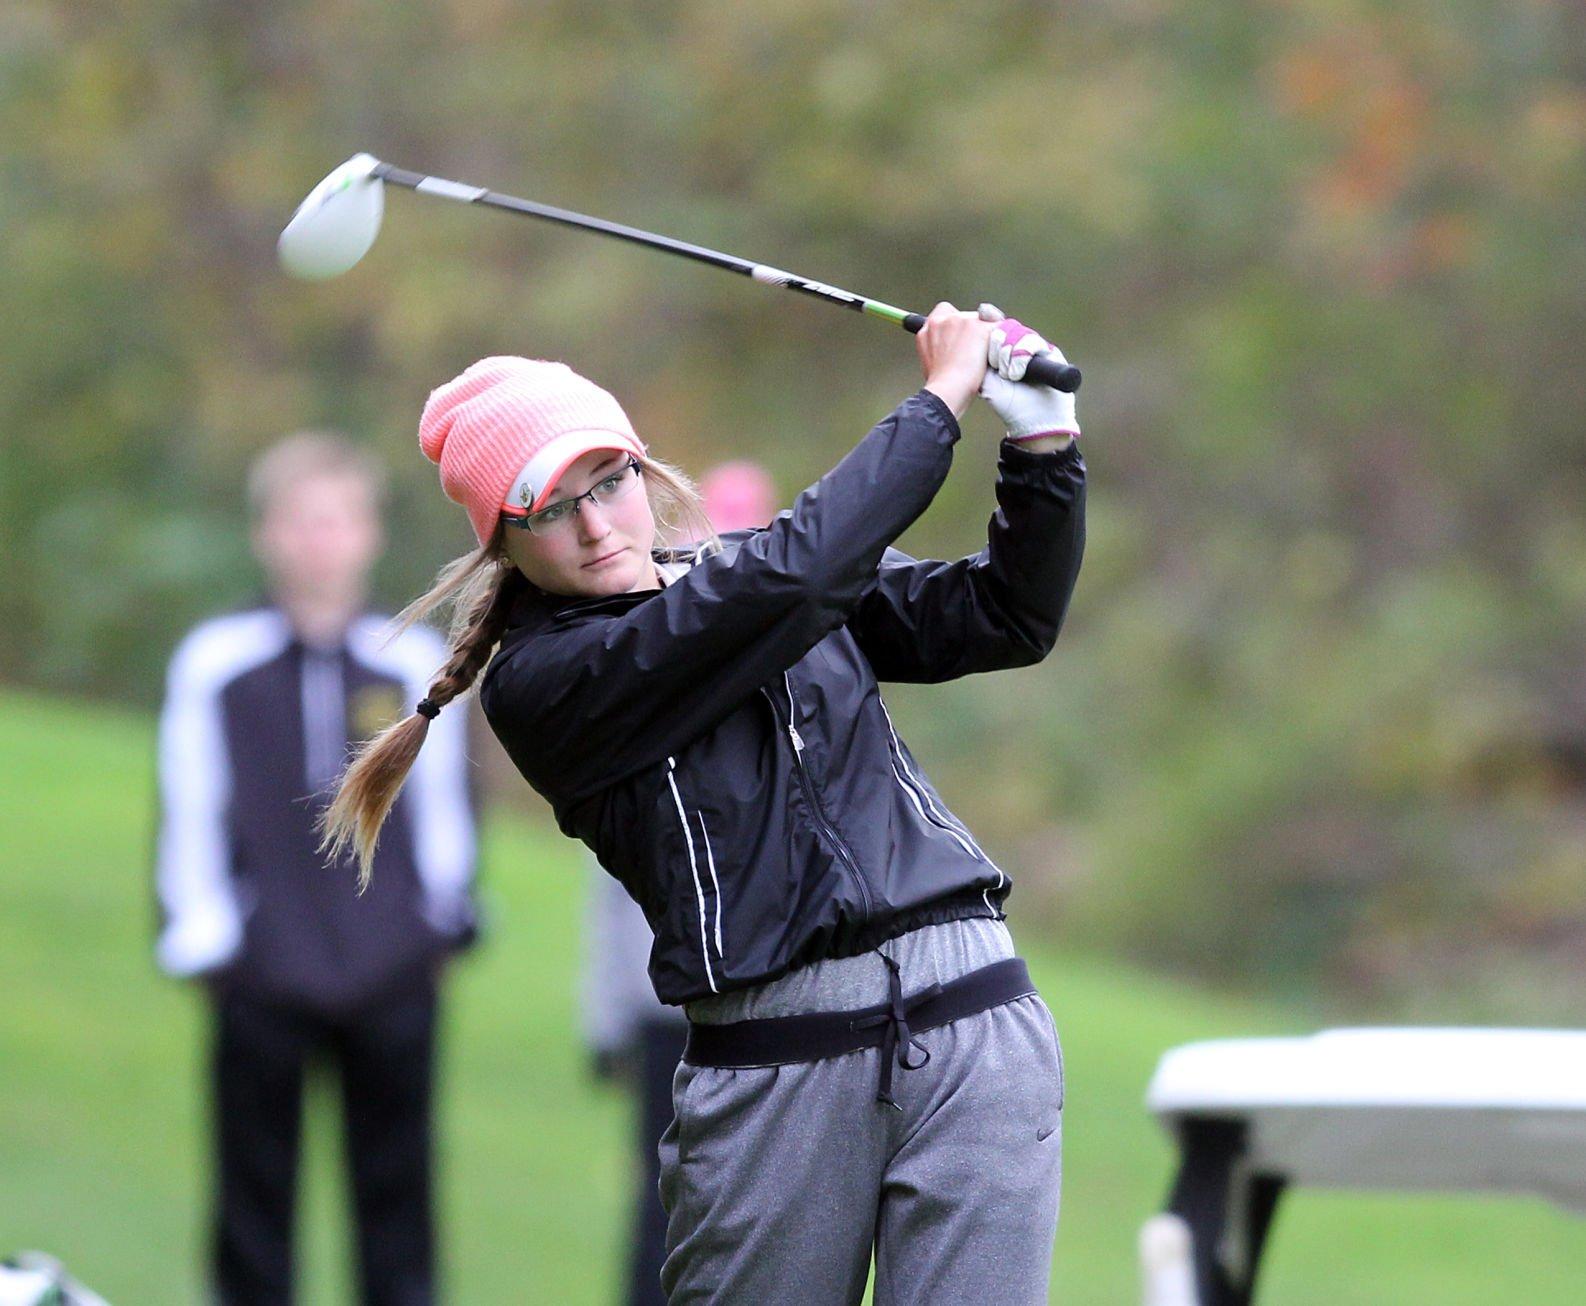 Emily powers amateur golfer